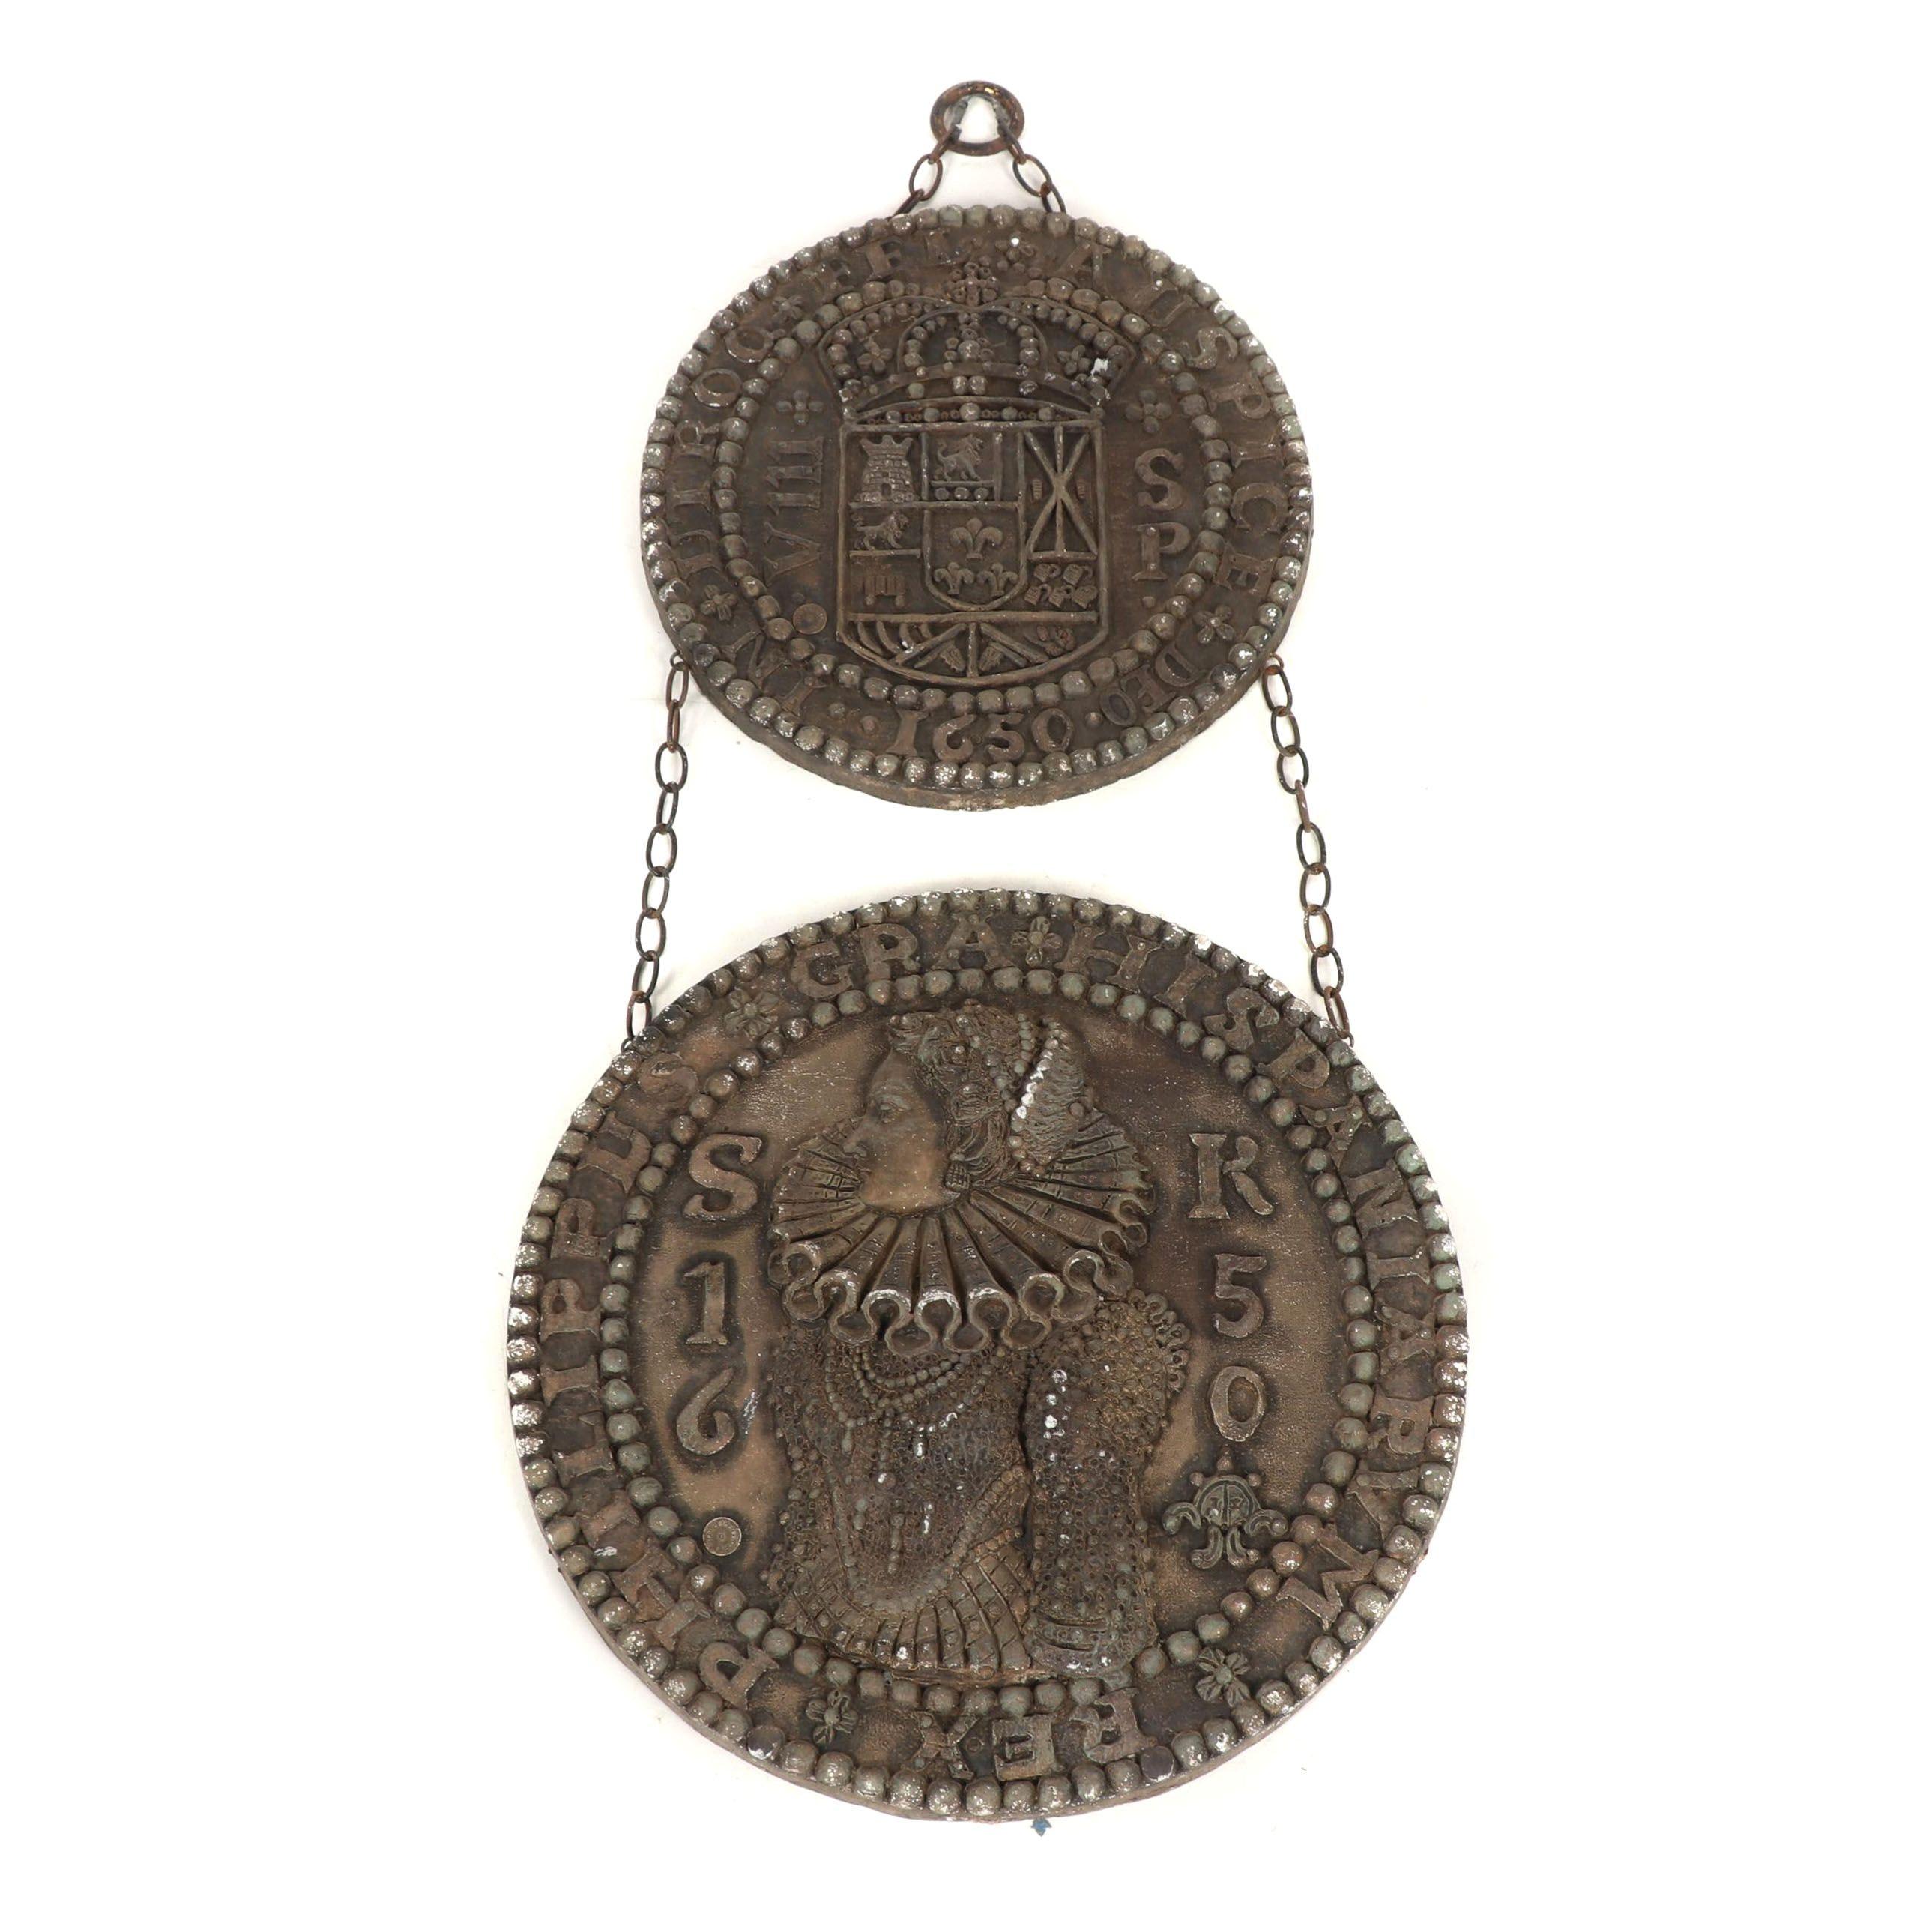 Harold Studios Inc. Plaster Fantasy Coin Wall Hangings, Mid-Century